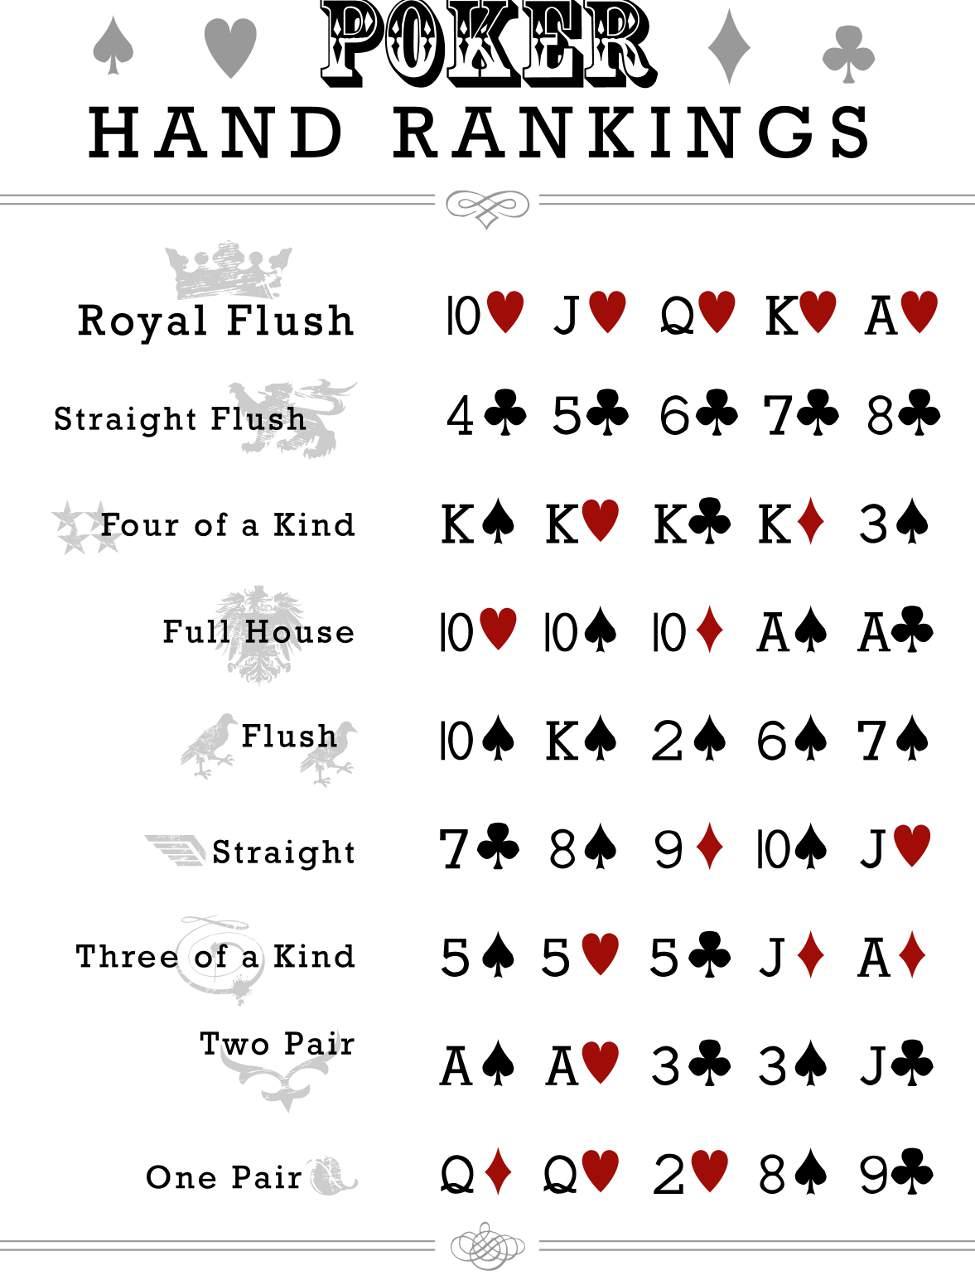 Drawn card poker #11